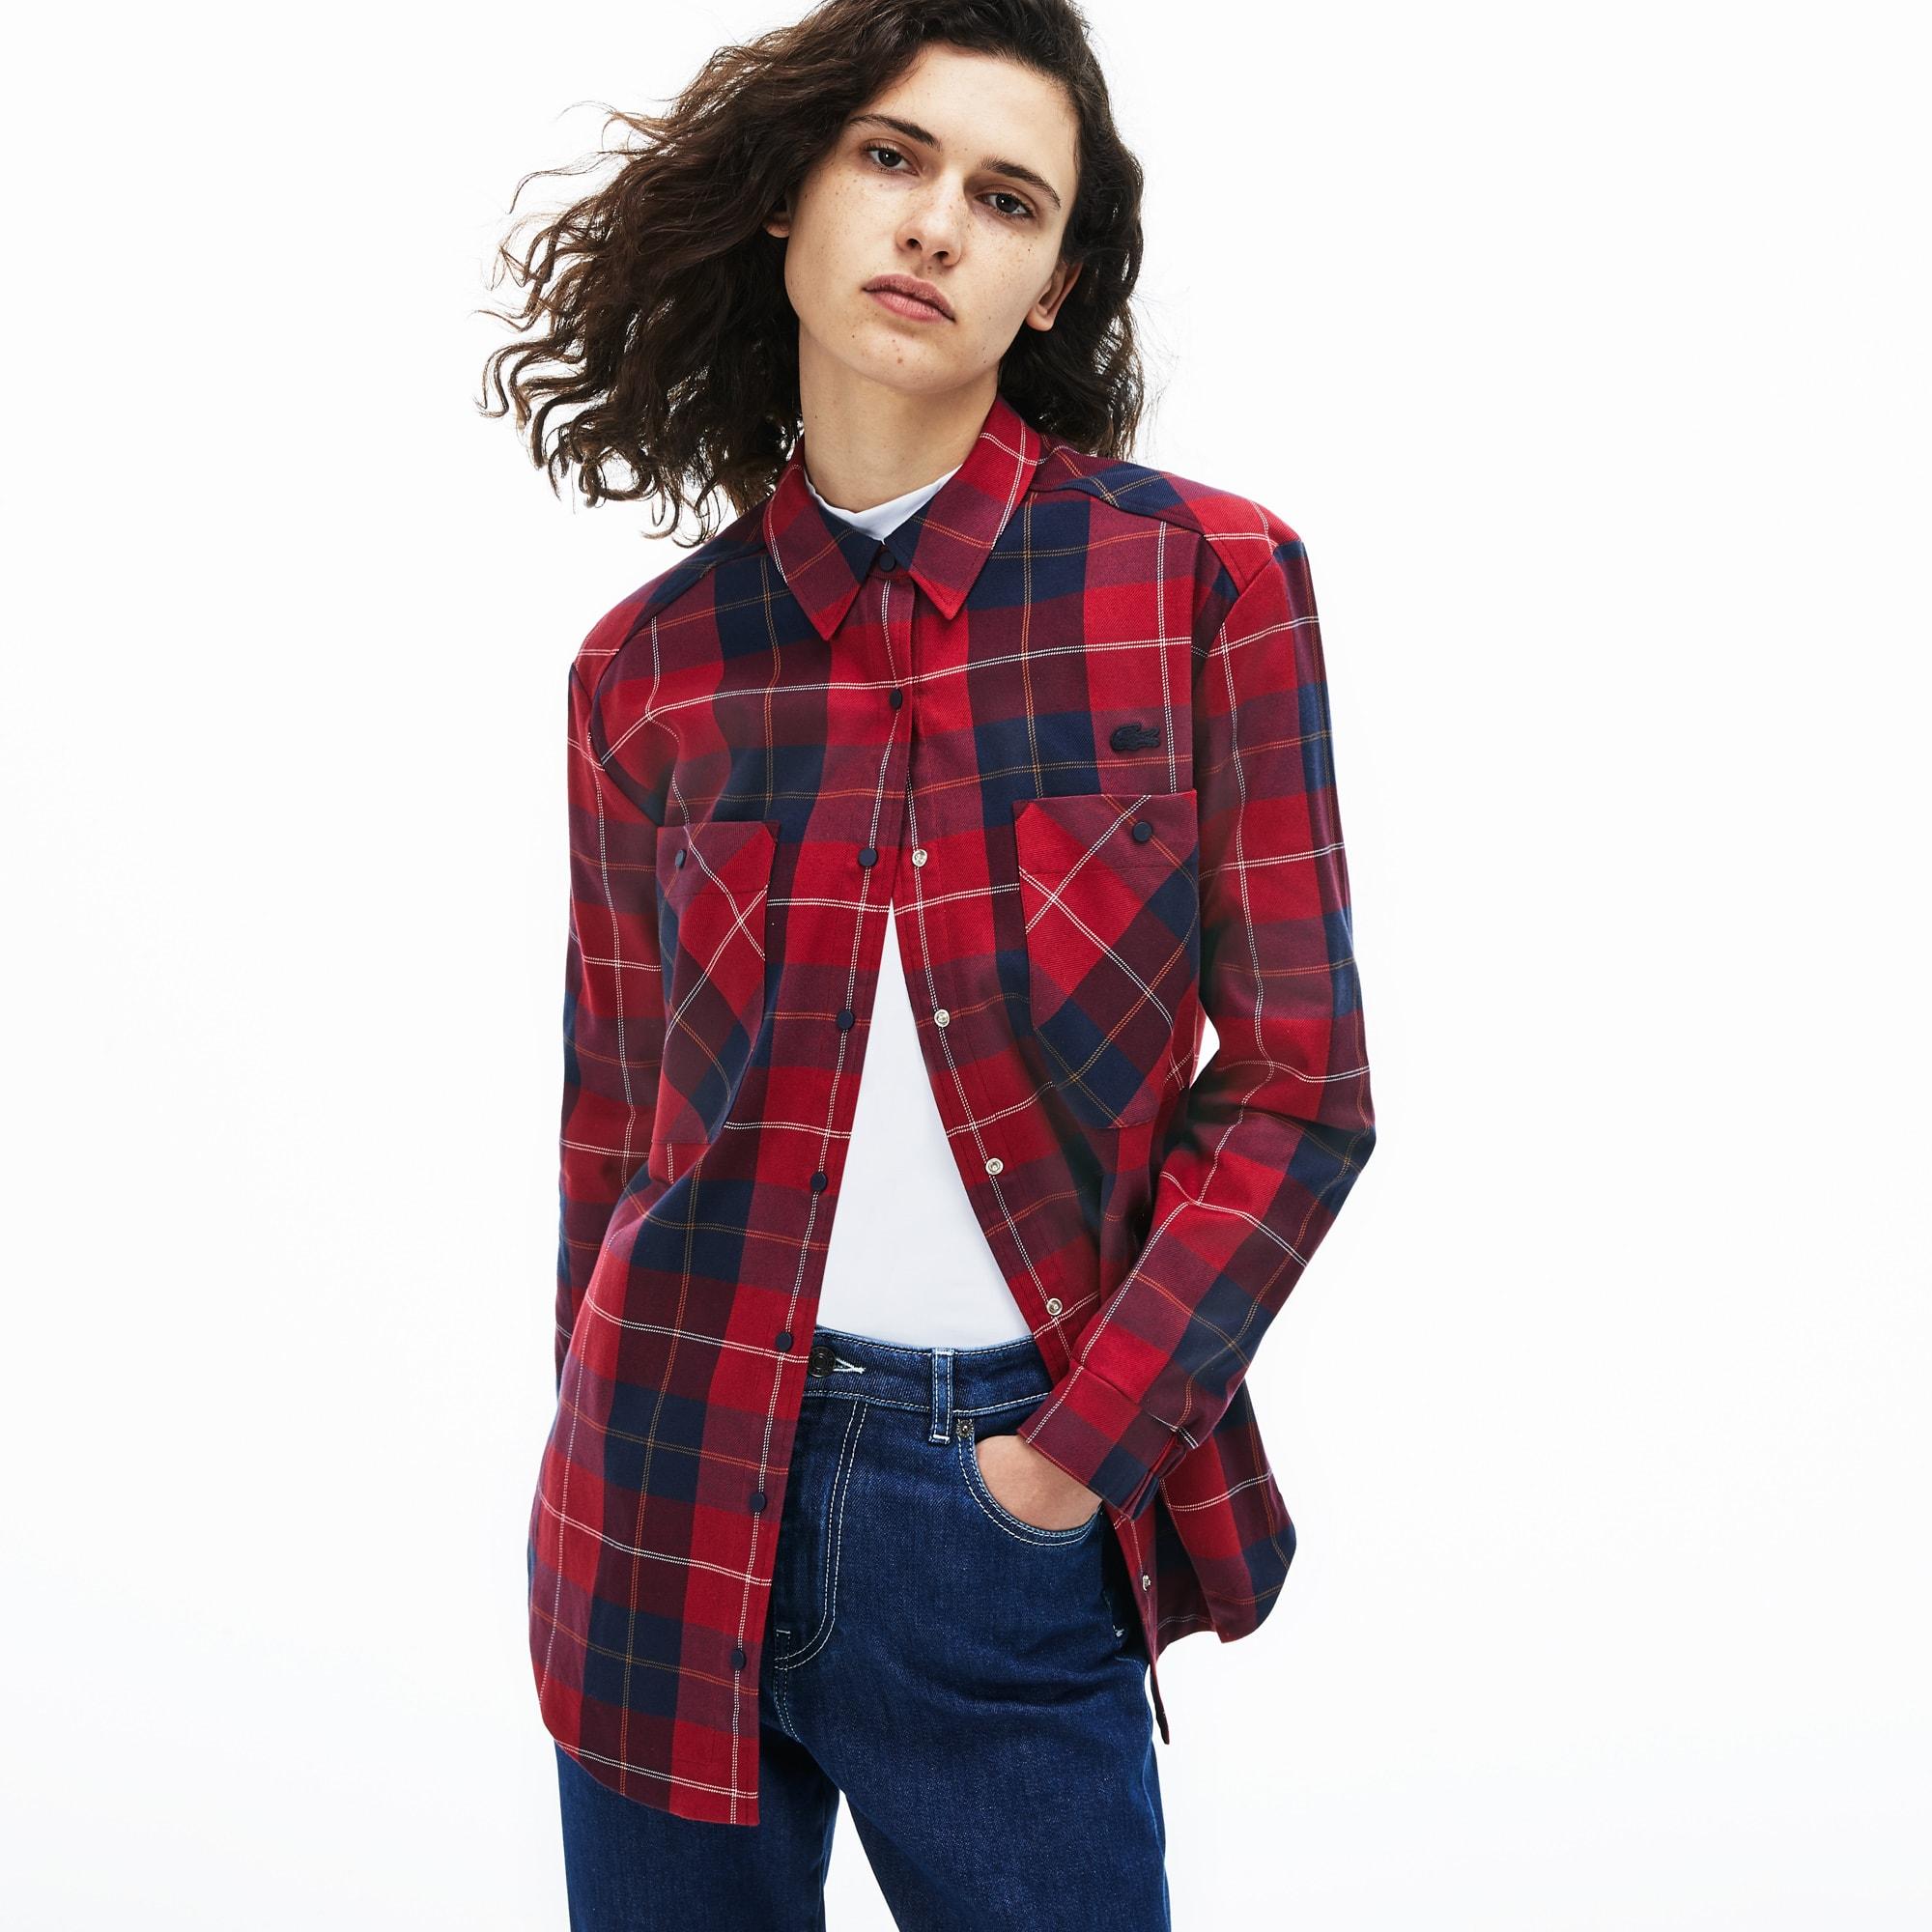 f288d732fa Chemises Hauts Femme Chemises amp; amp; Lacoste Hauts rpxTqr8